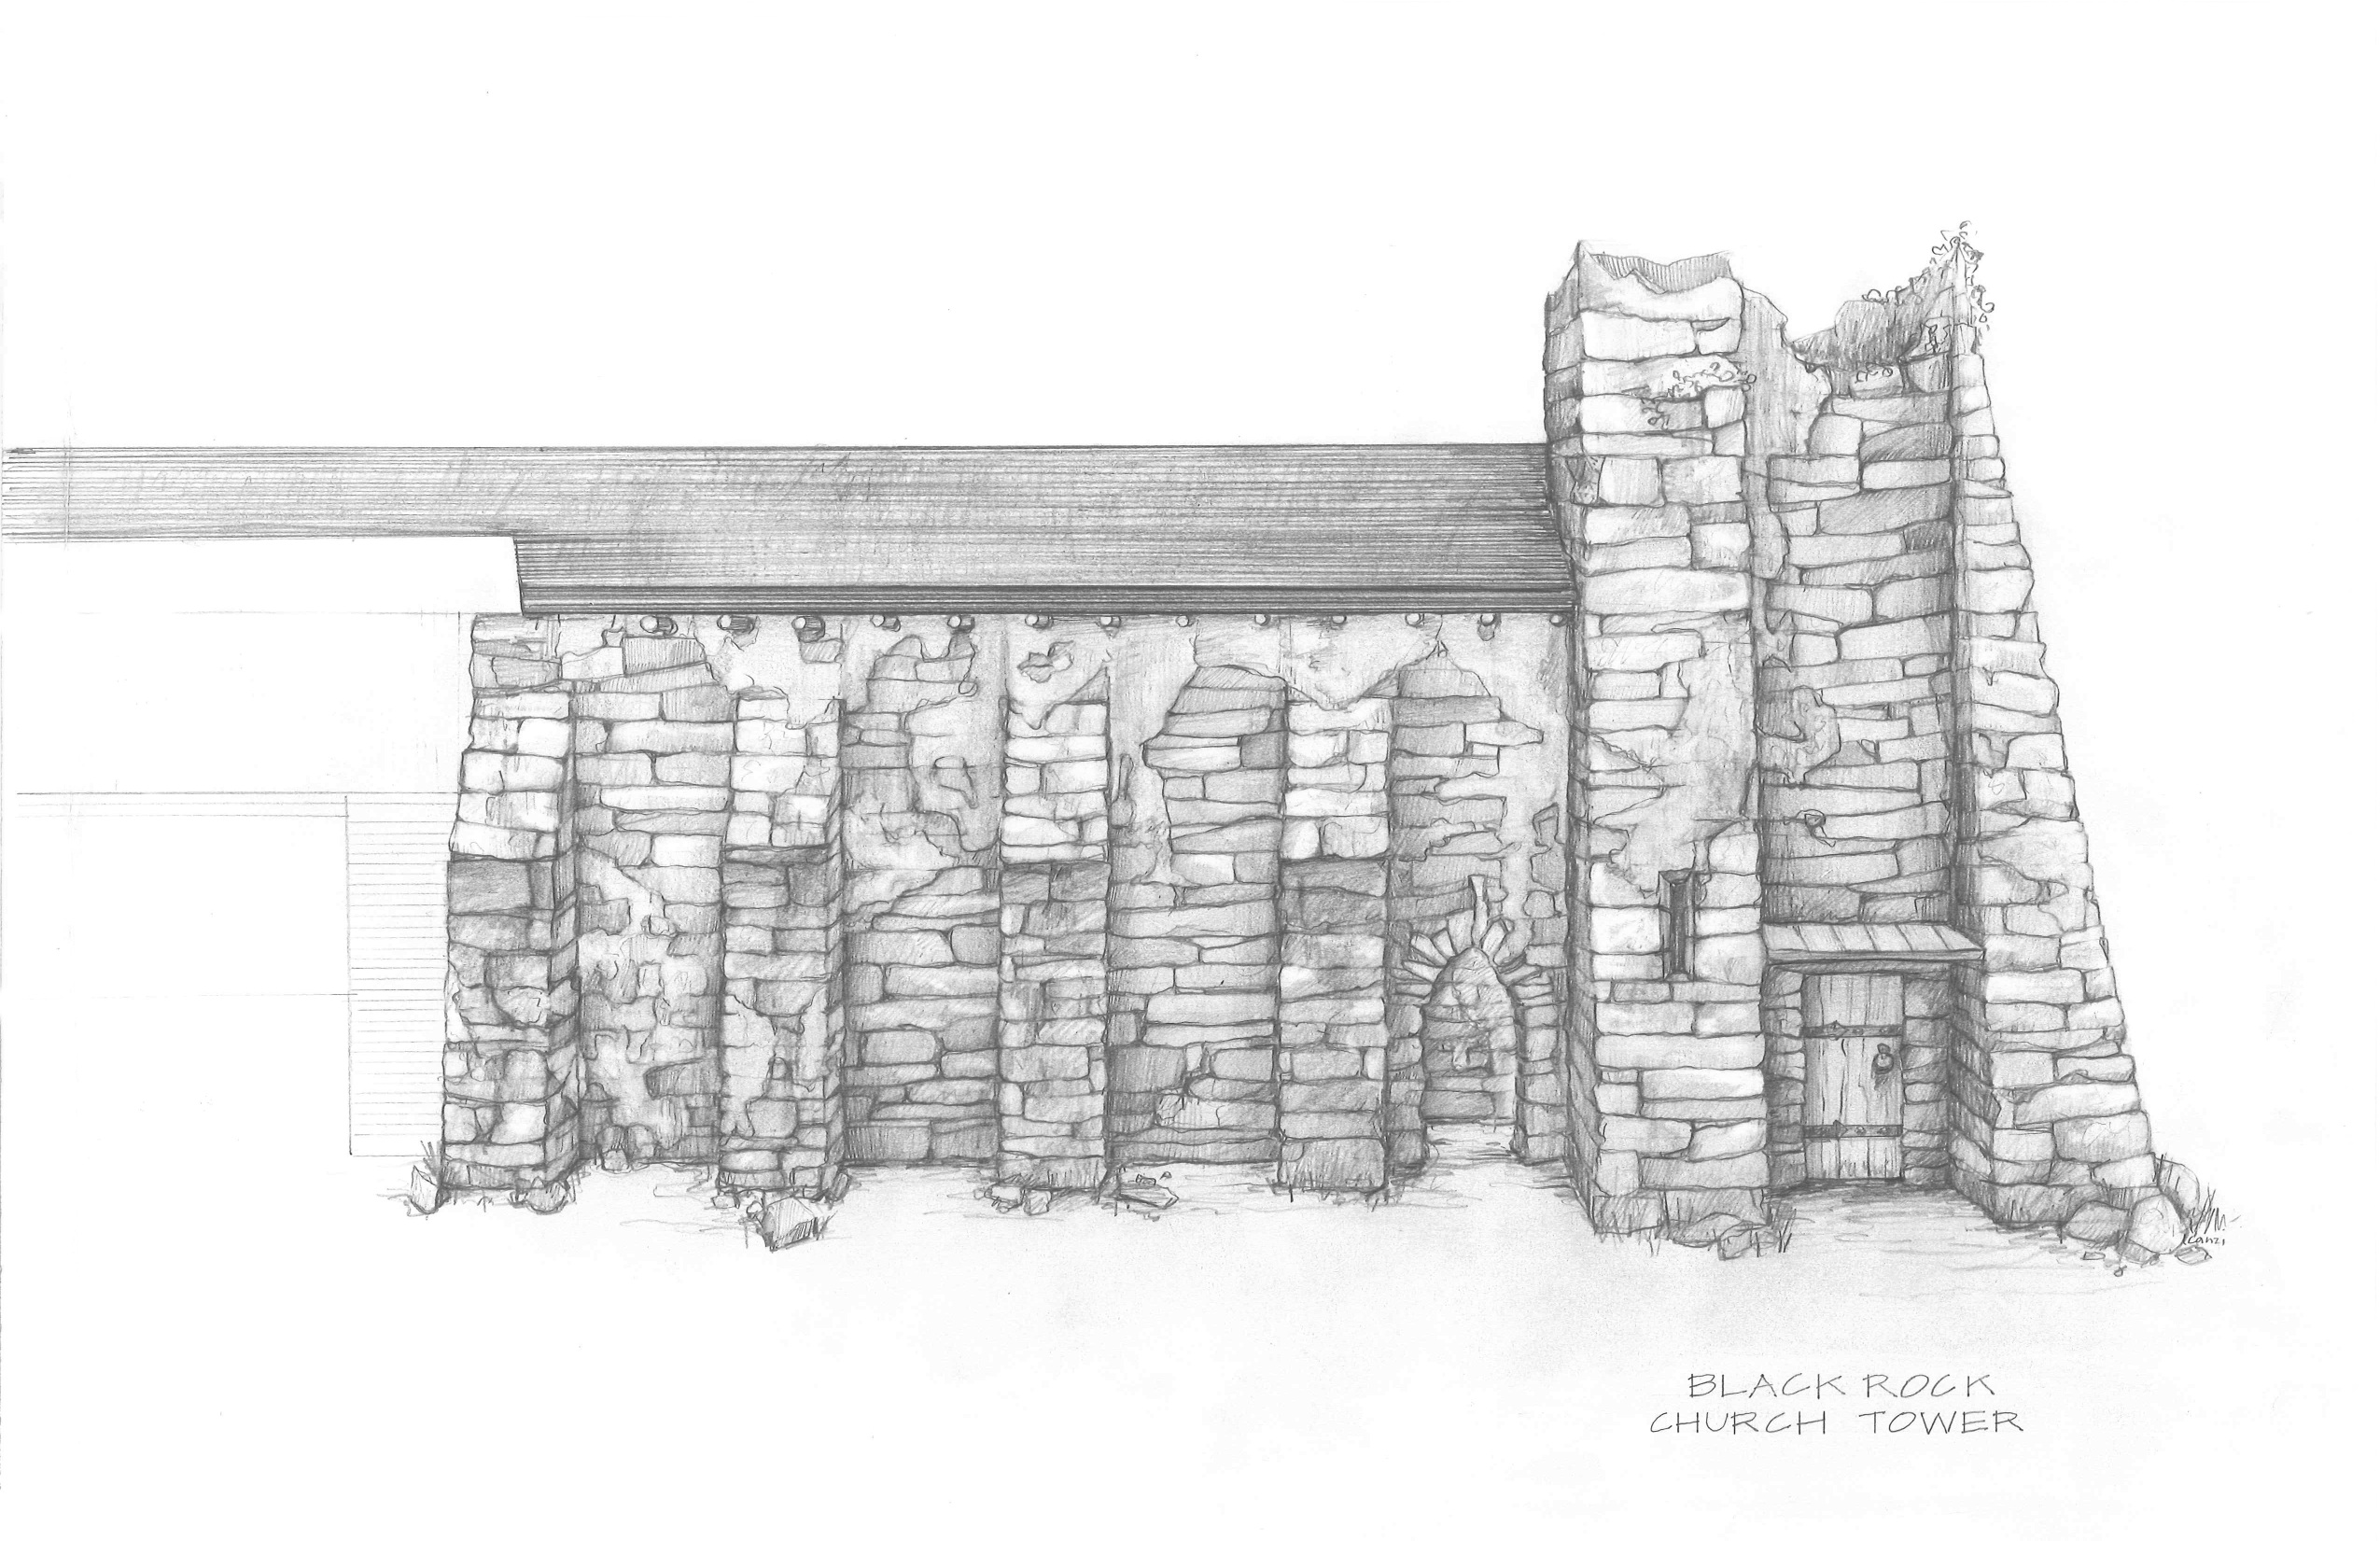 DRAGONSTEEL BLACKROCK TOWER